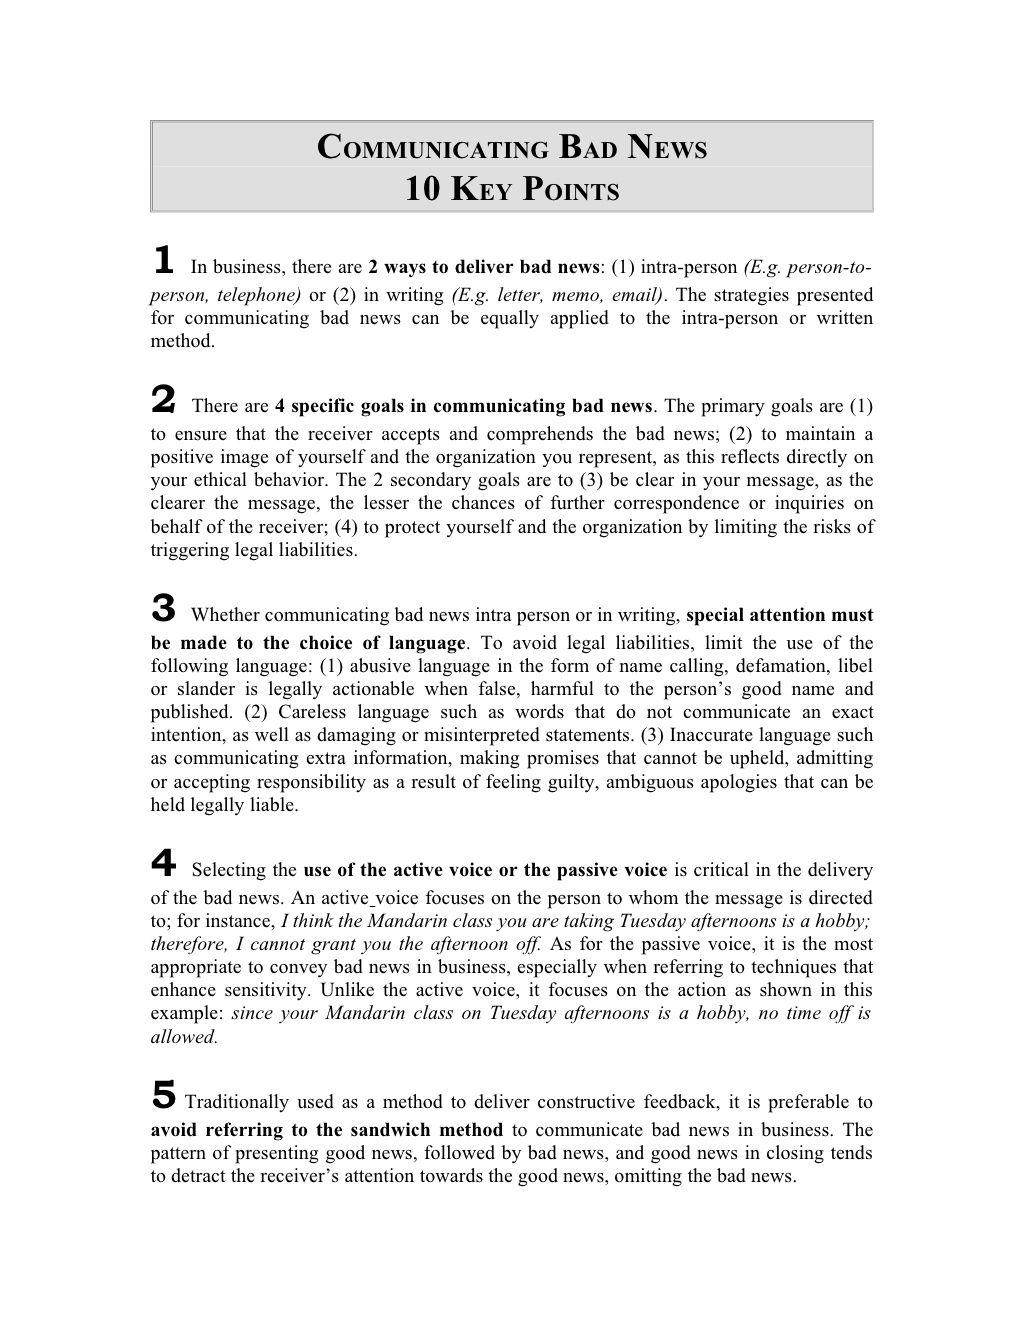 10 Key Points For Delivering Bad News By Sid Via Slideshare